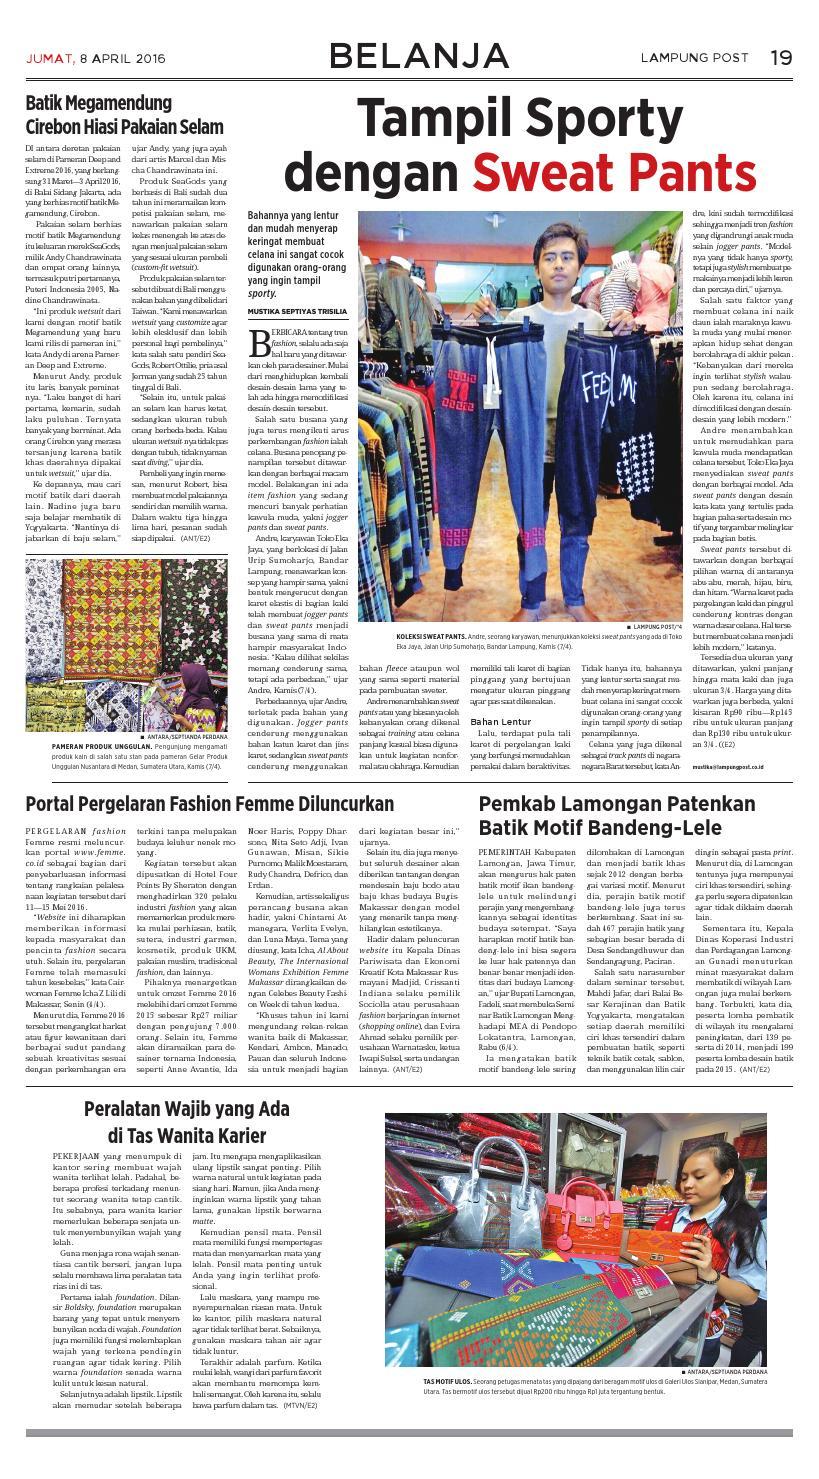 Lampung Post Jumat 8 April 2016 By Issuu Poppy Dharsono Batik Katun